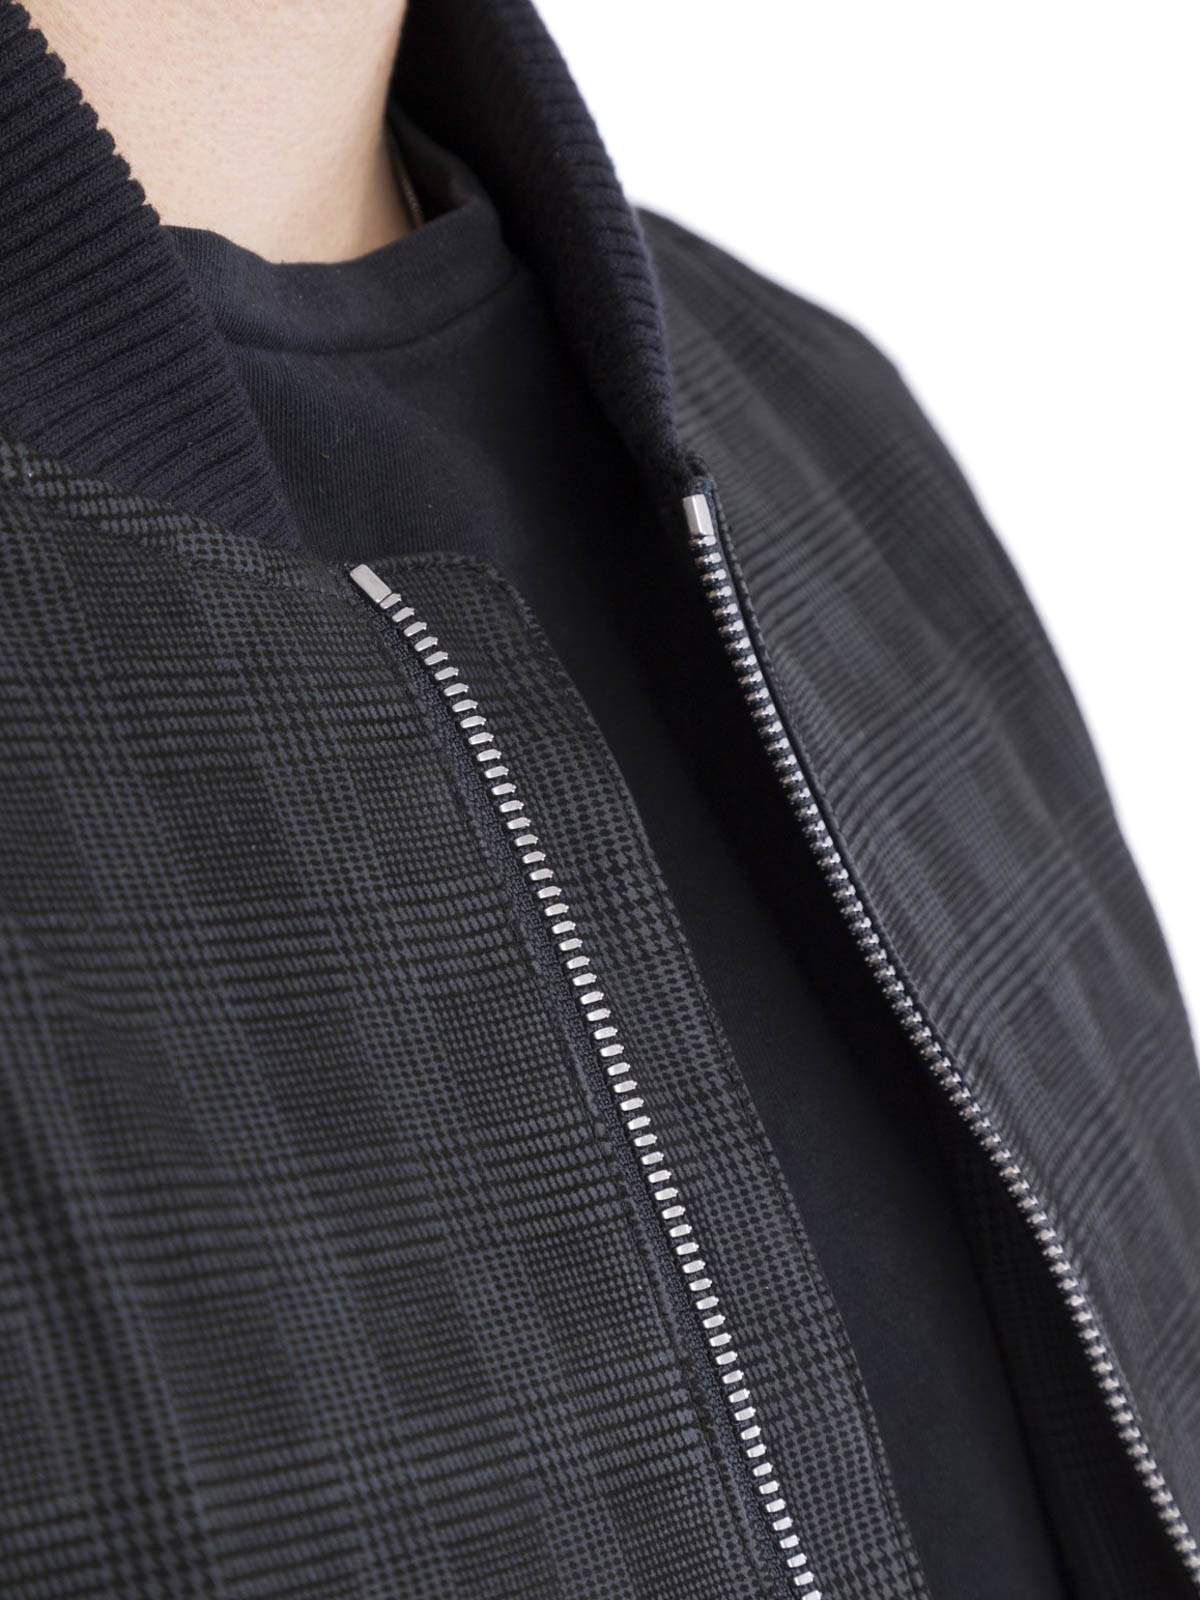 4d0f0a1e4 Corneliani - Black nappa bomber jacket - leather jacket ...